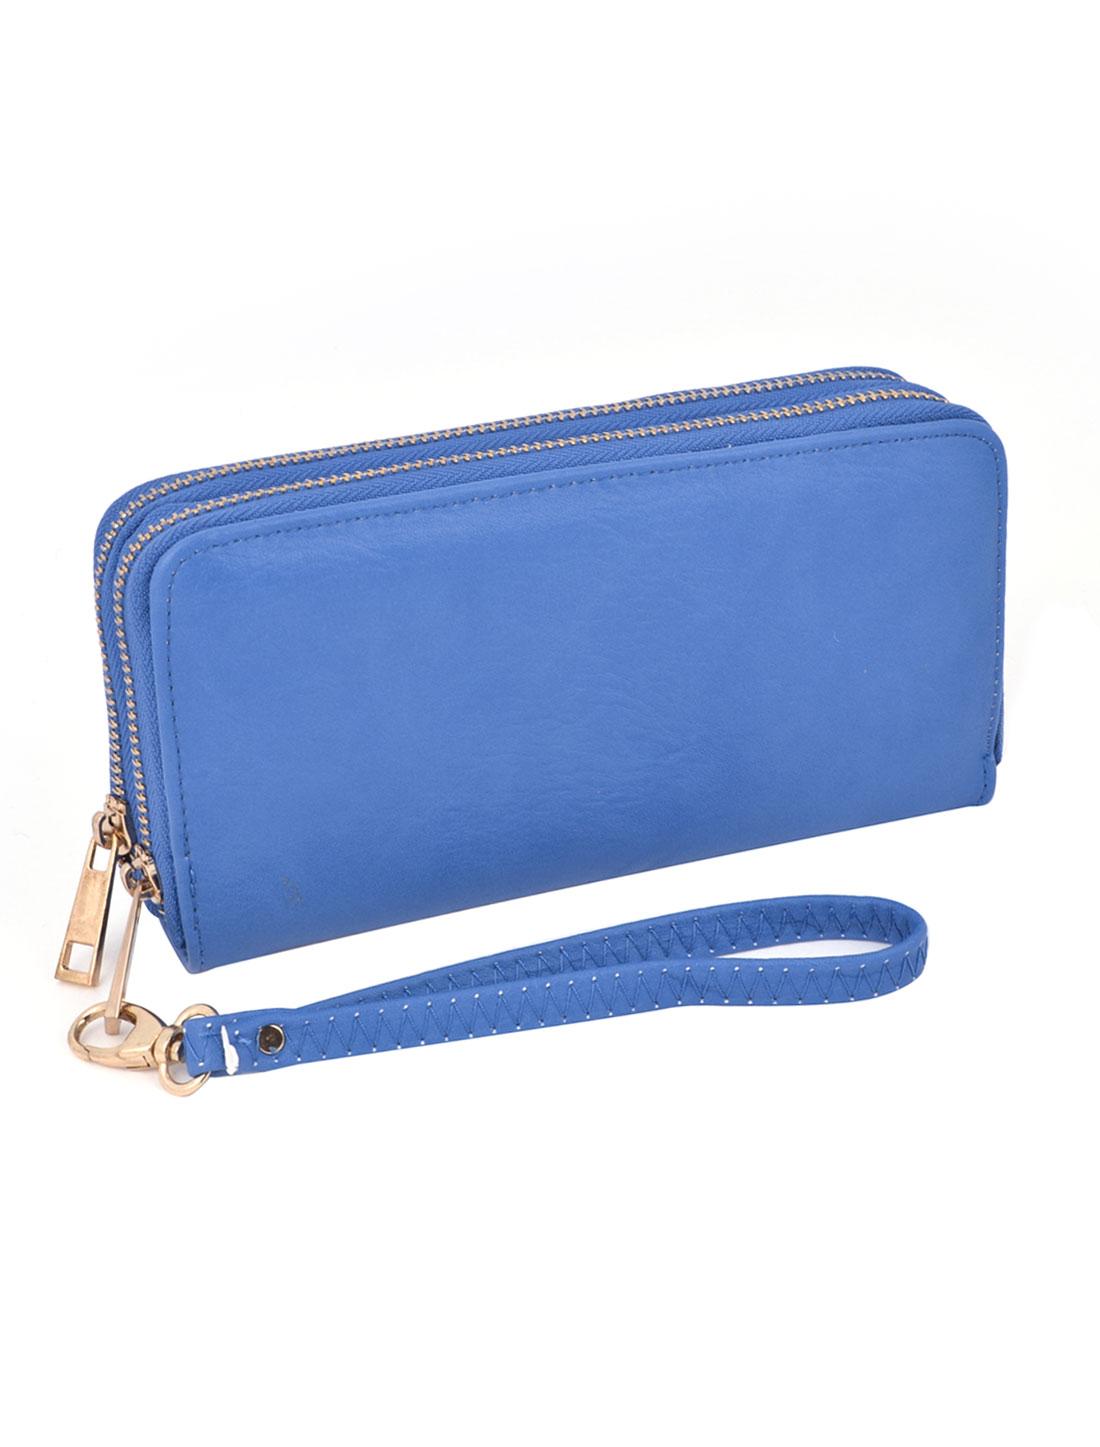 Ladies Double Zipper Colsure 6 Compartments Blue Faux Leather Money Change Bank Cards Organizer Wallet w Wrist Strap